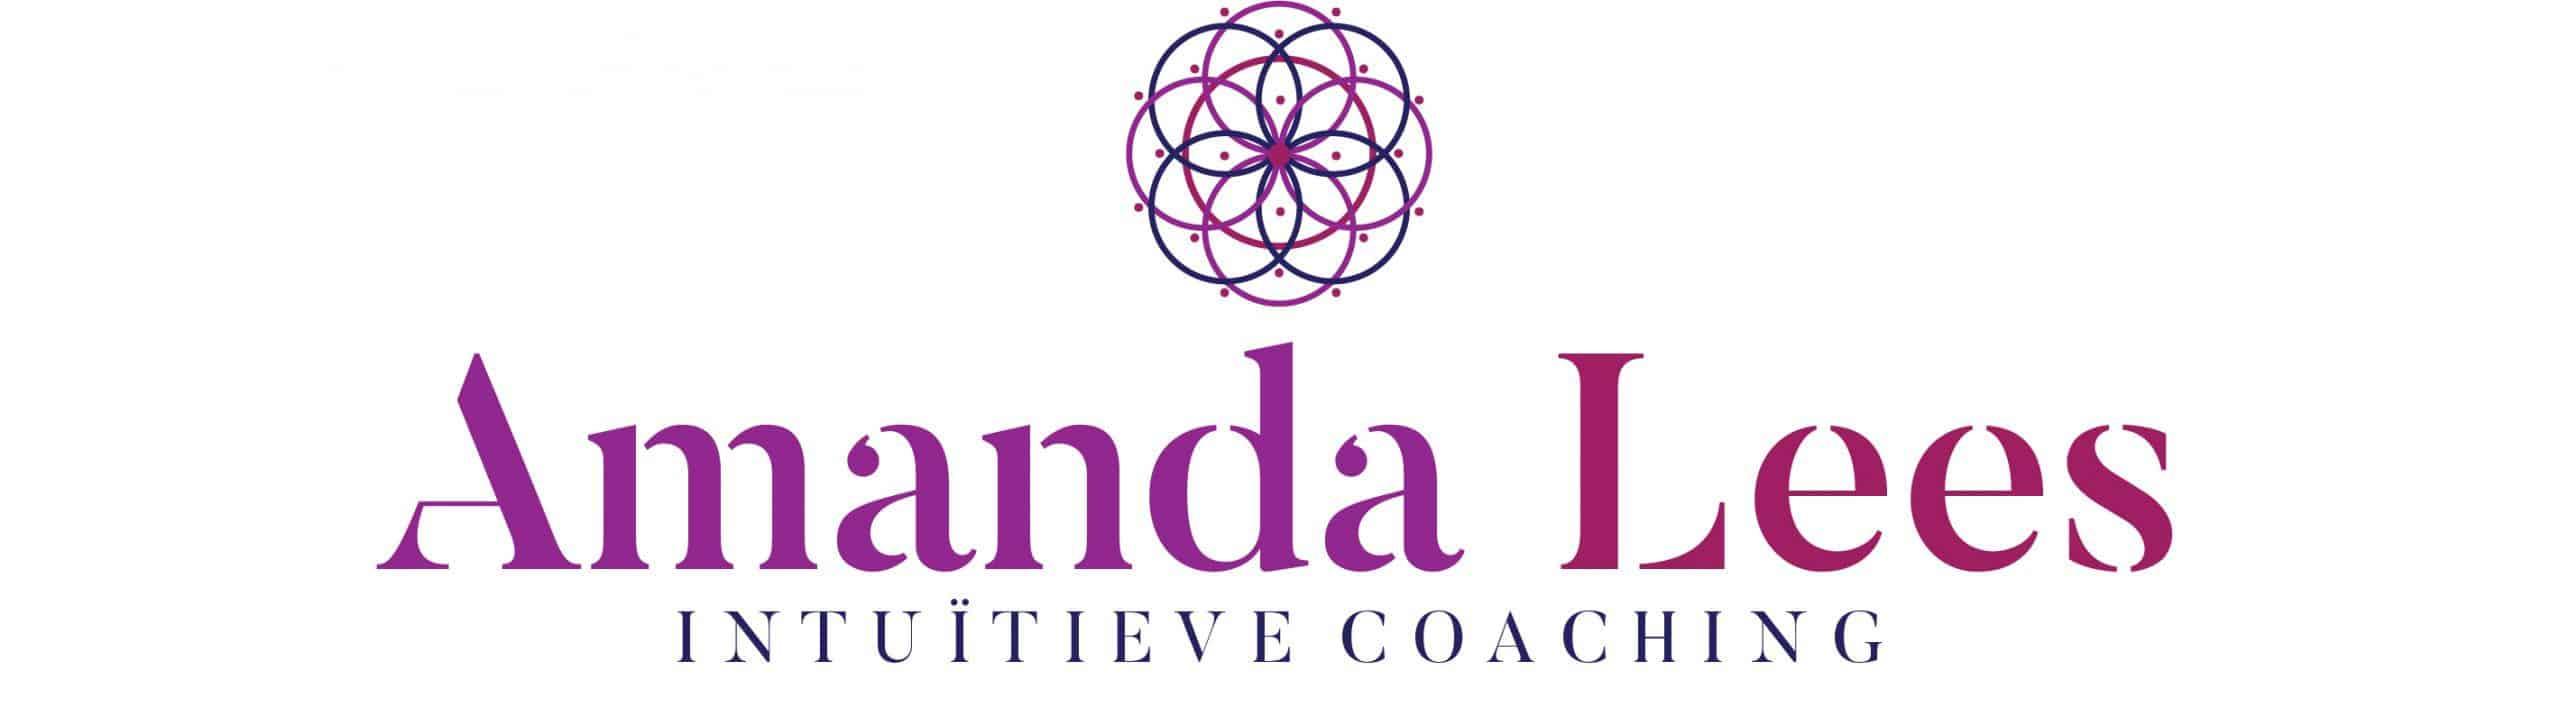 Amanda Lees Academie